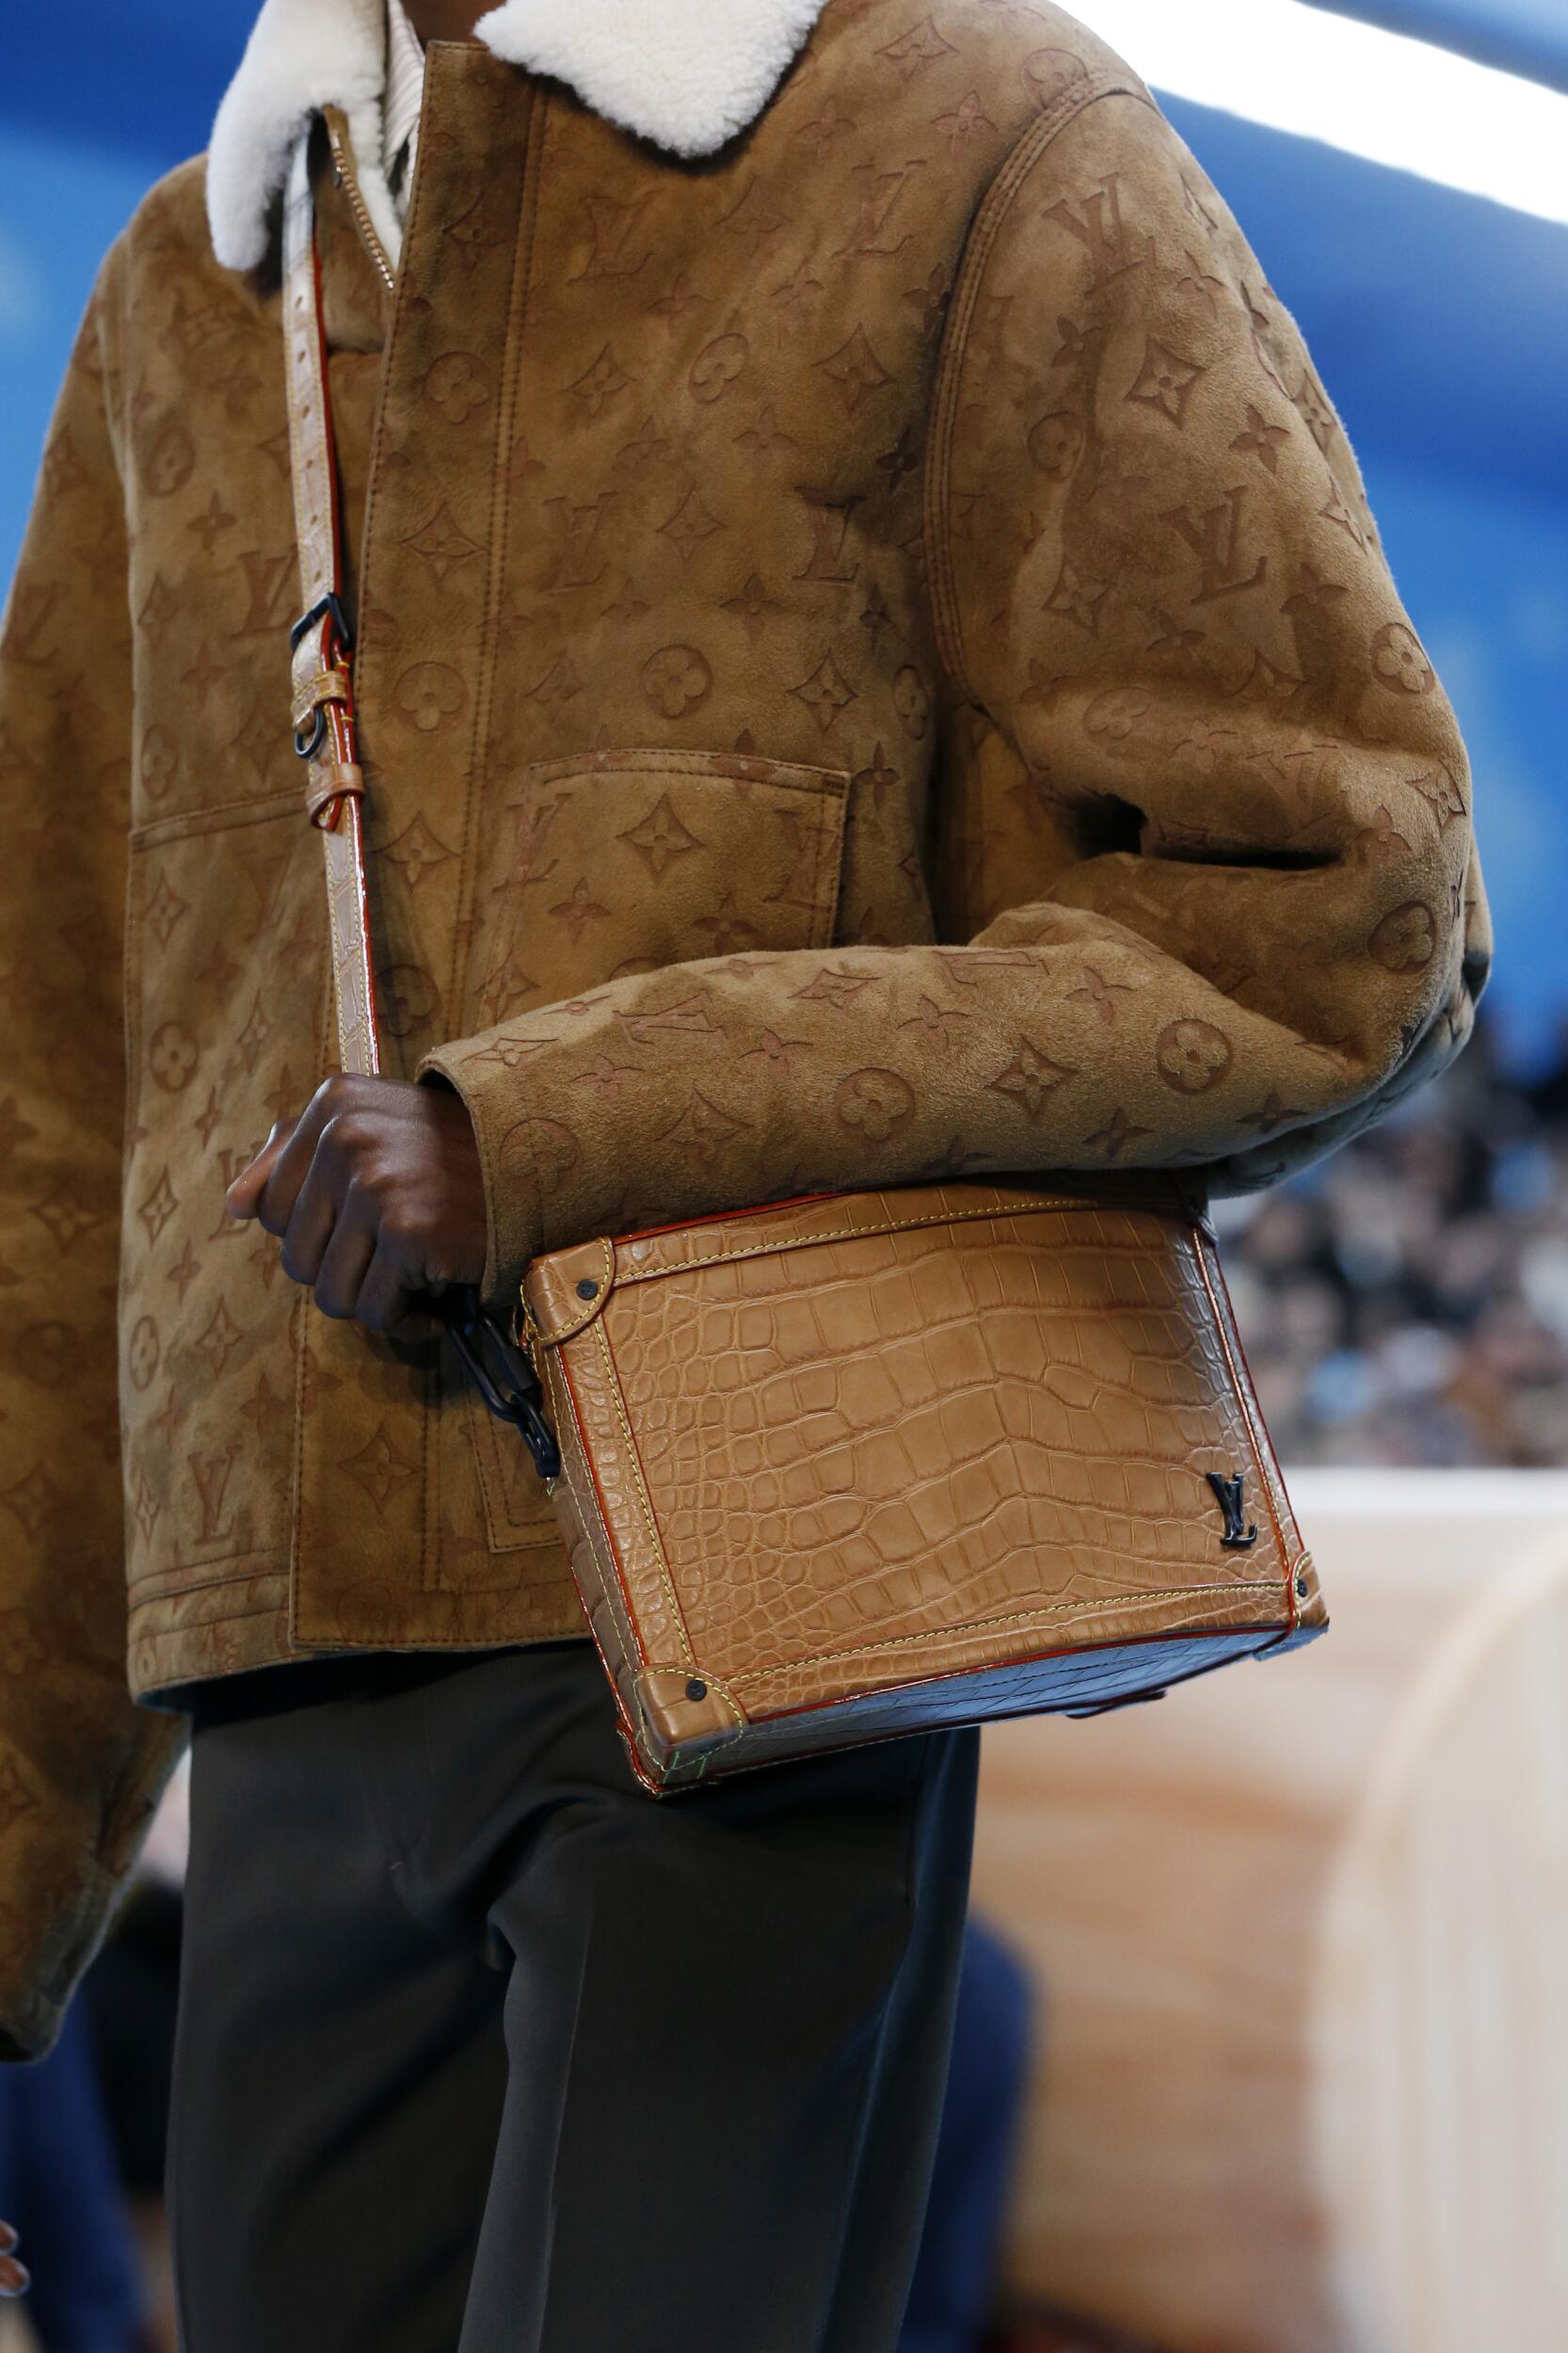 Louis Vuitton Handbag Detail 2020